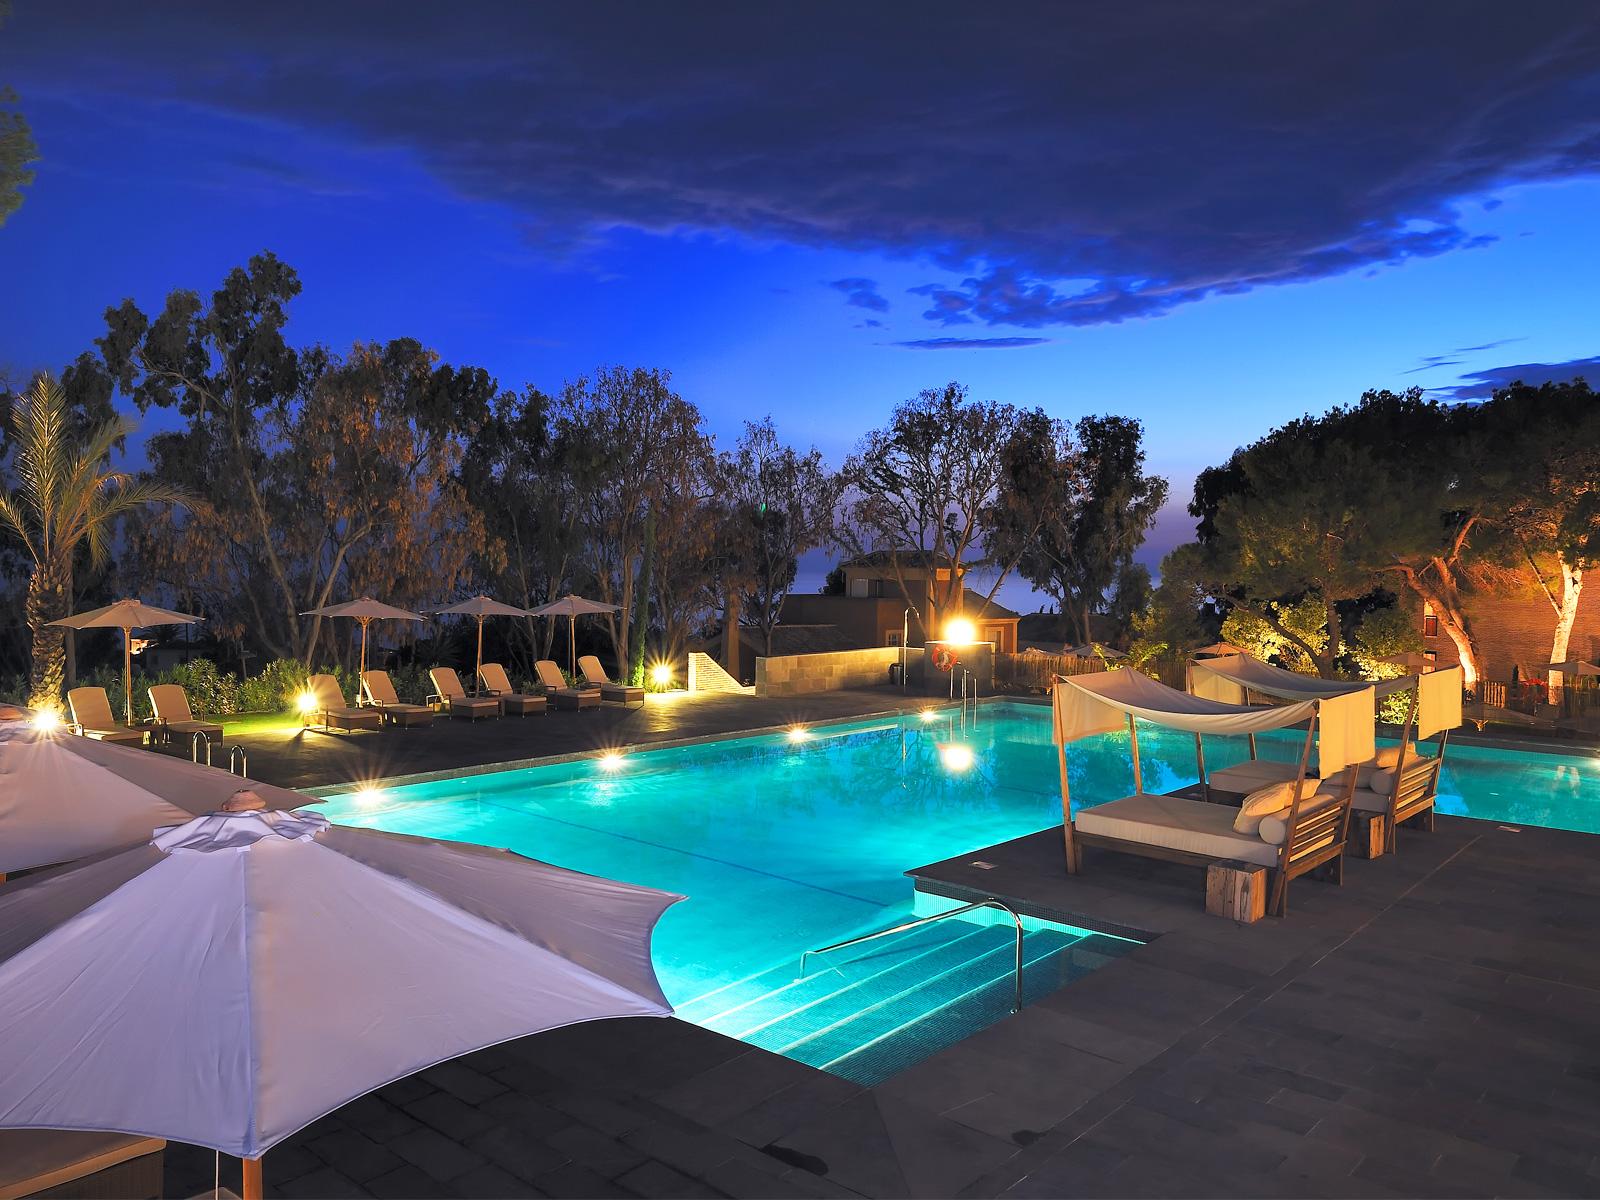 hotel malaga 5 estrella: